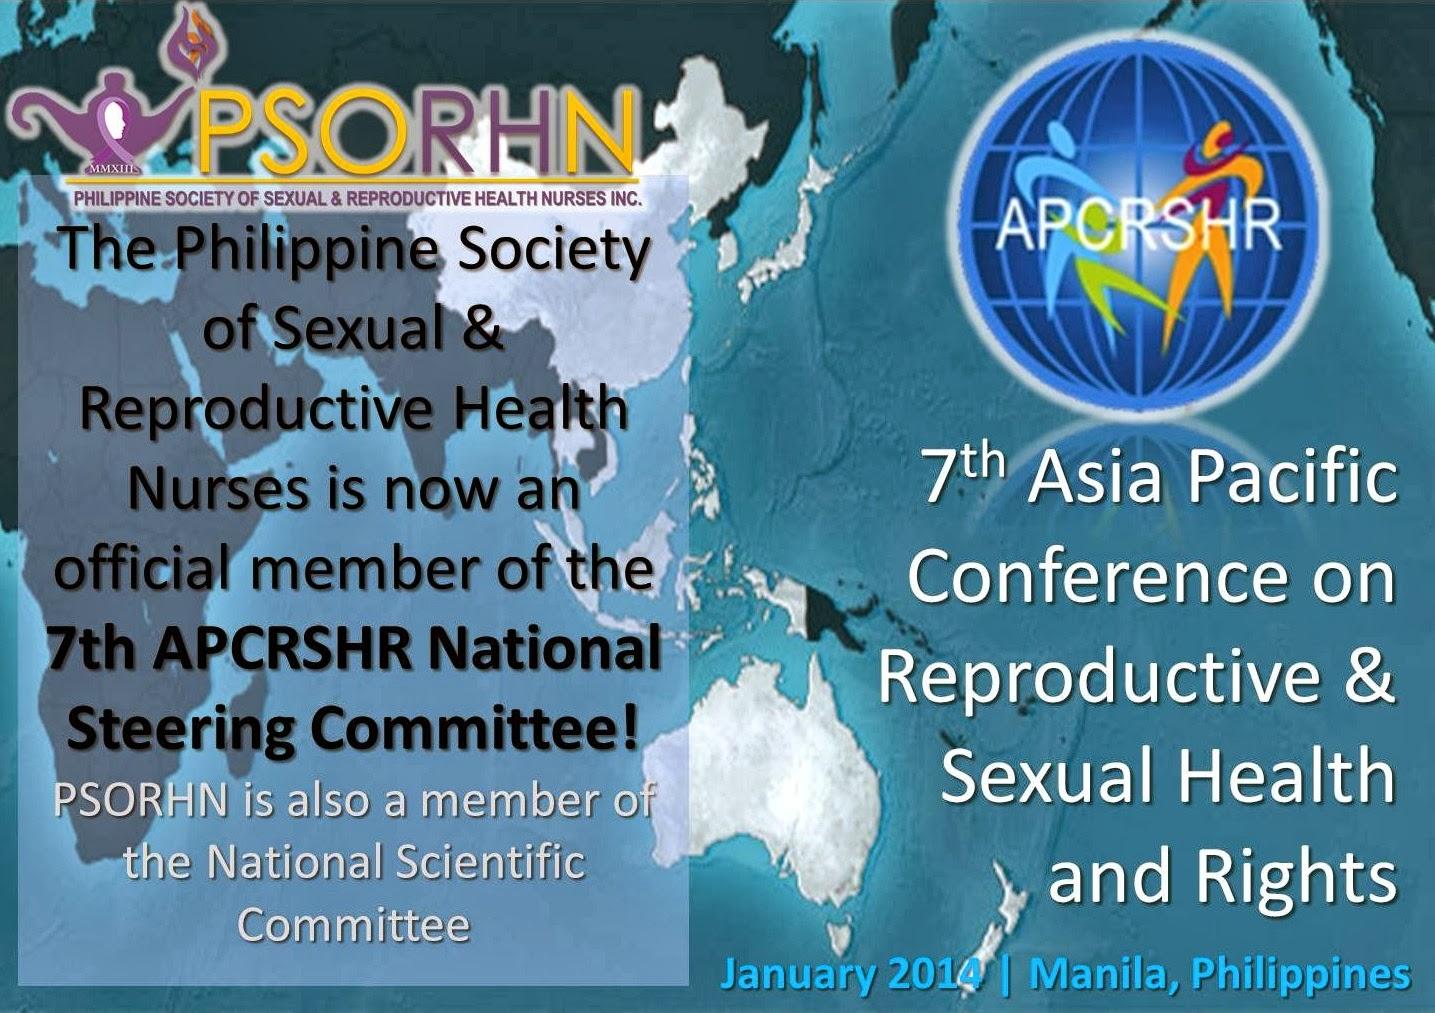 7th APCRSHR JAN 2014 MANILA